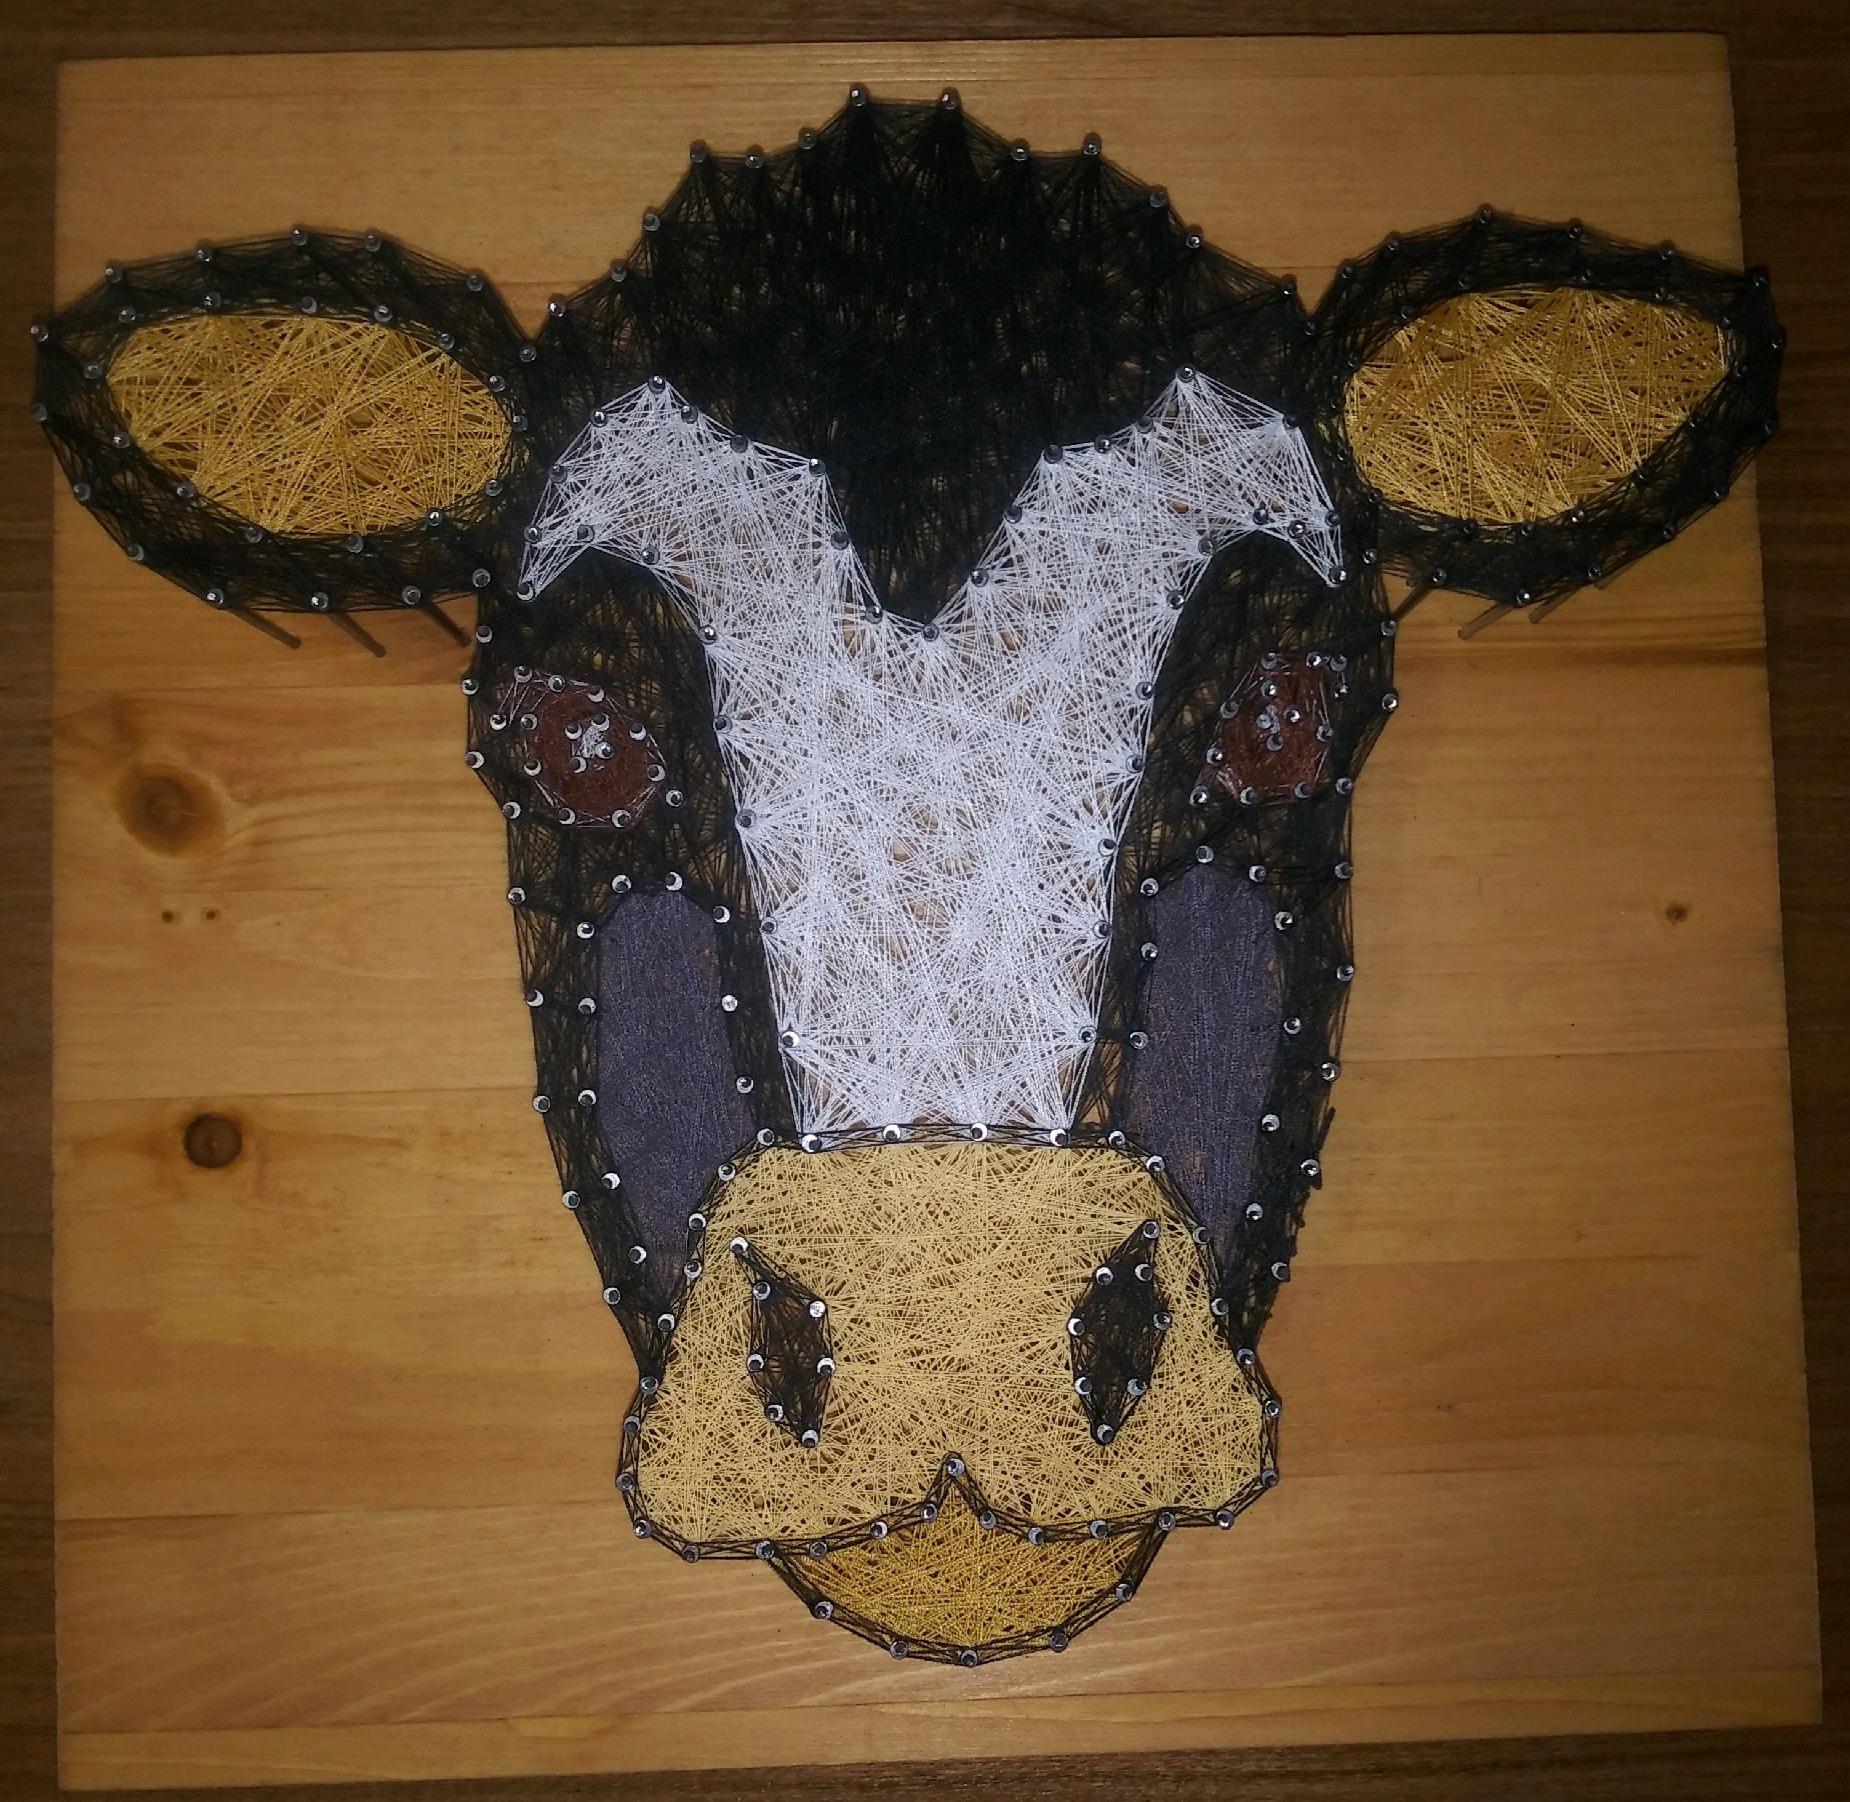 12x12 Cow